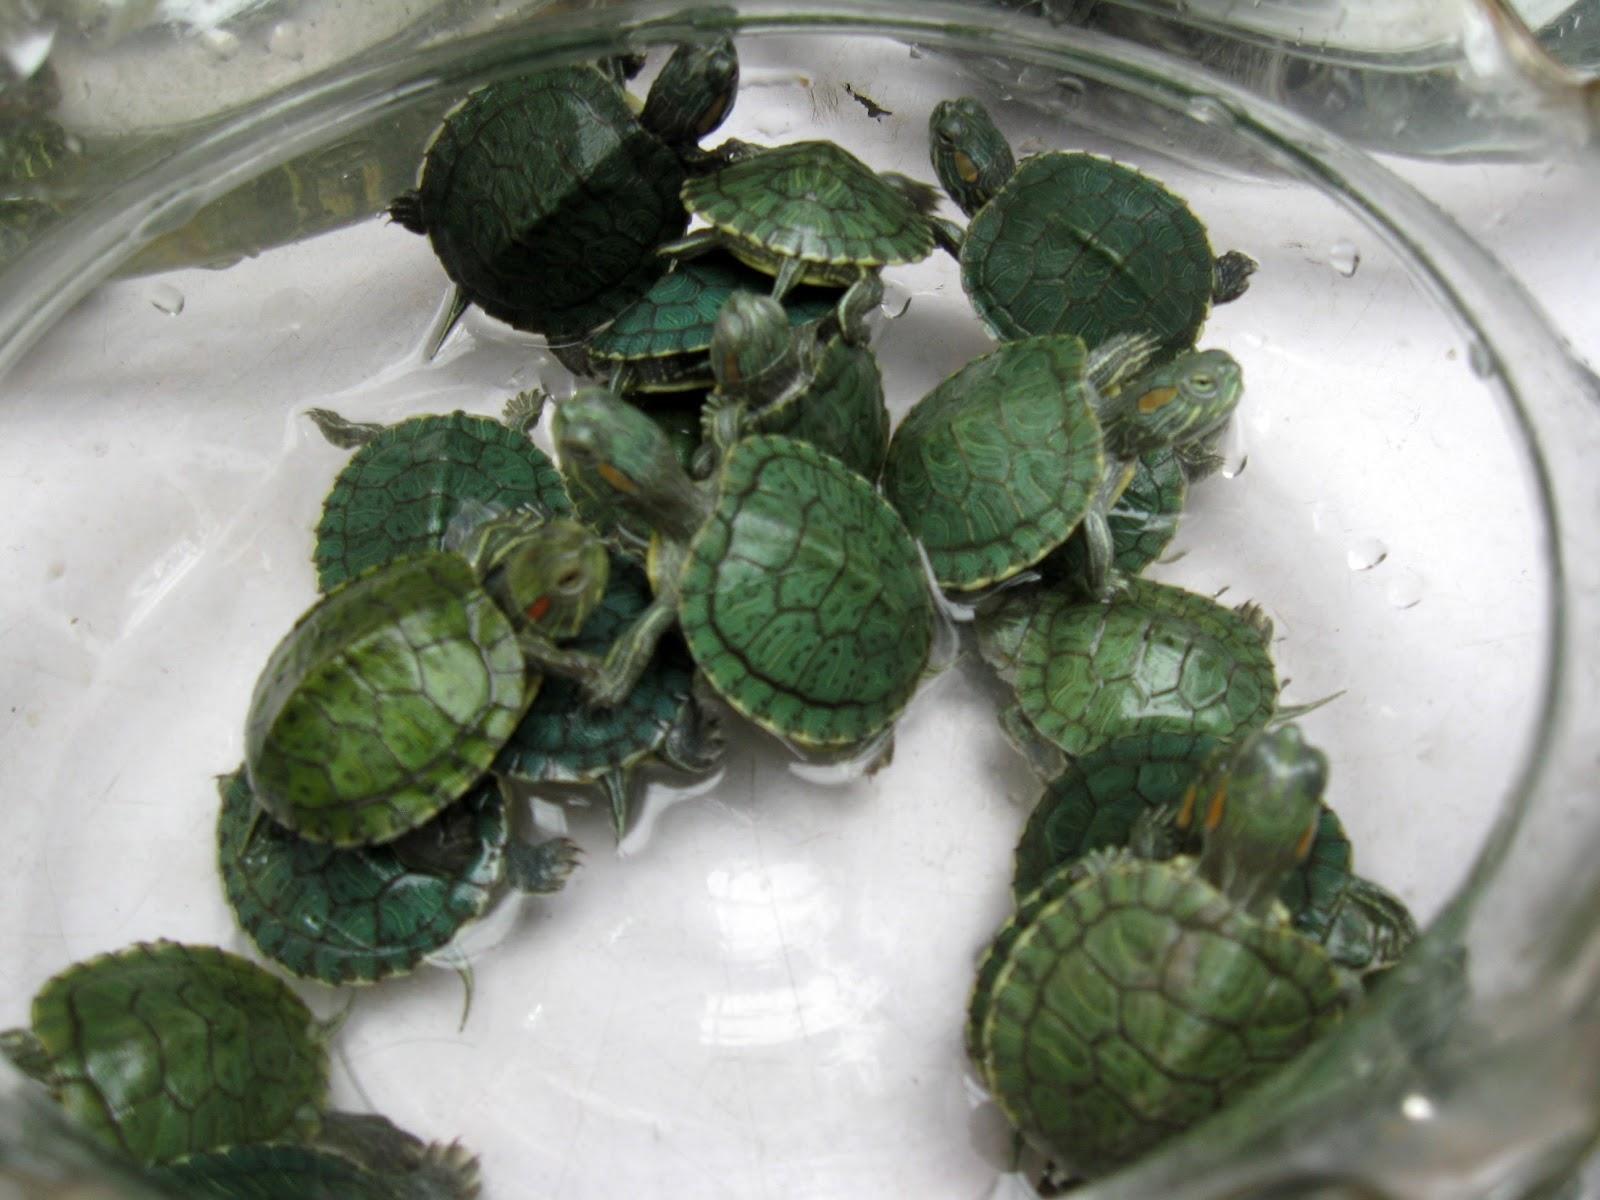 Baby Pet Turtles Baby turtles: